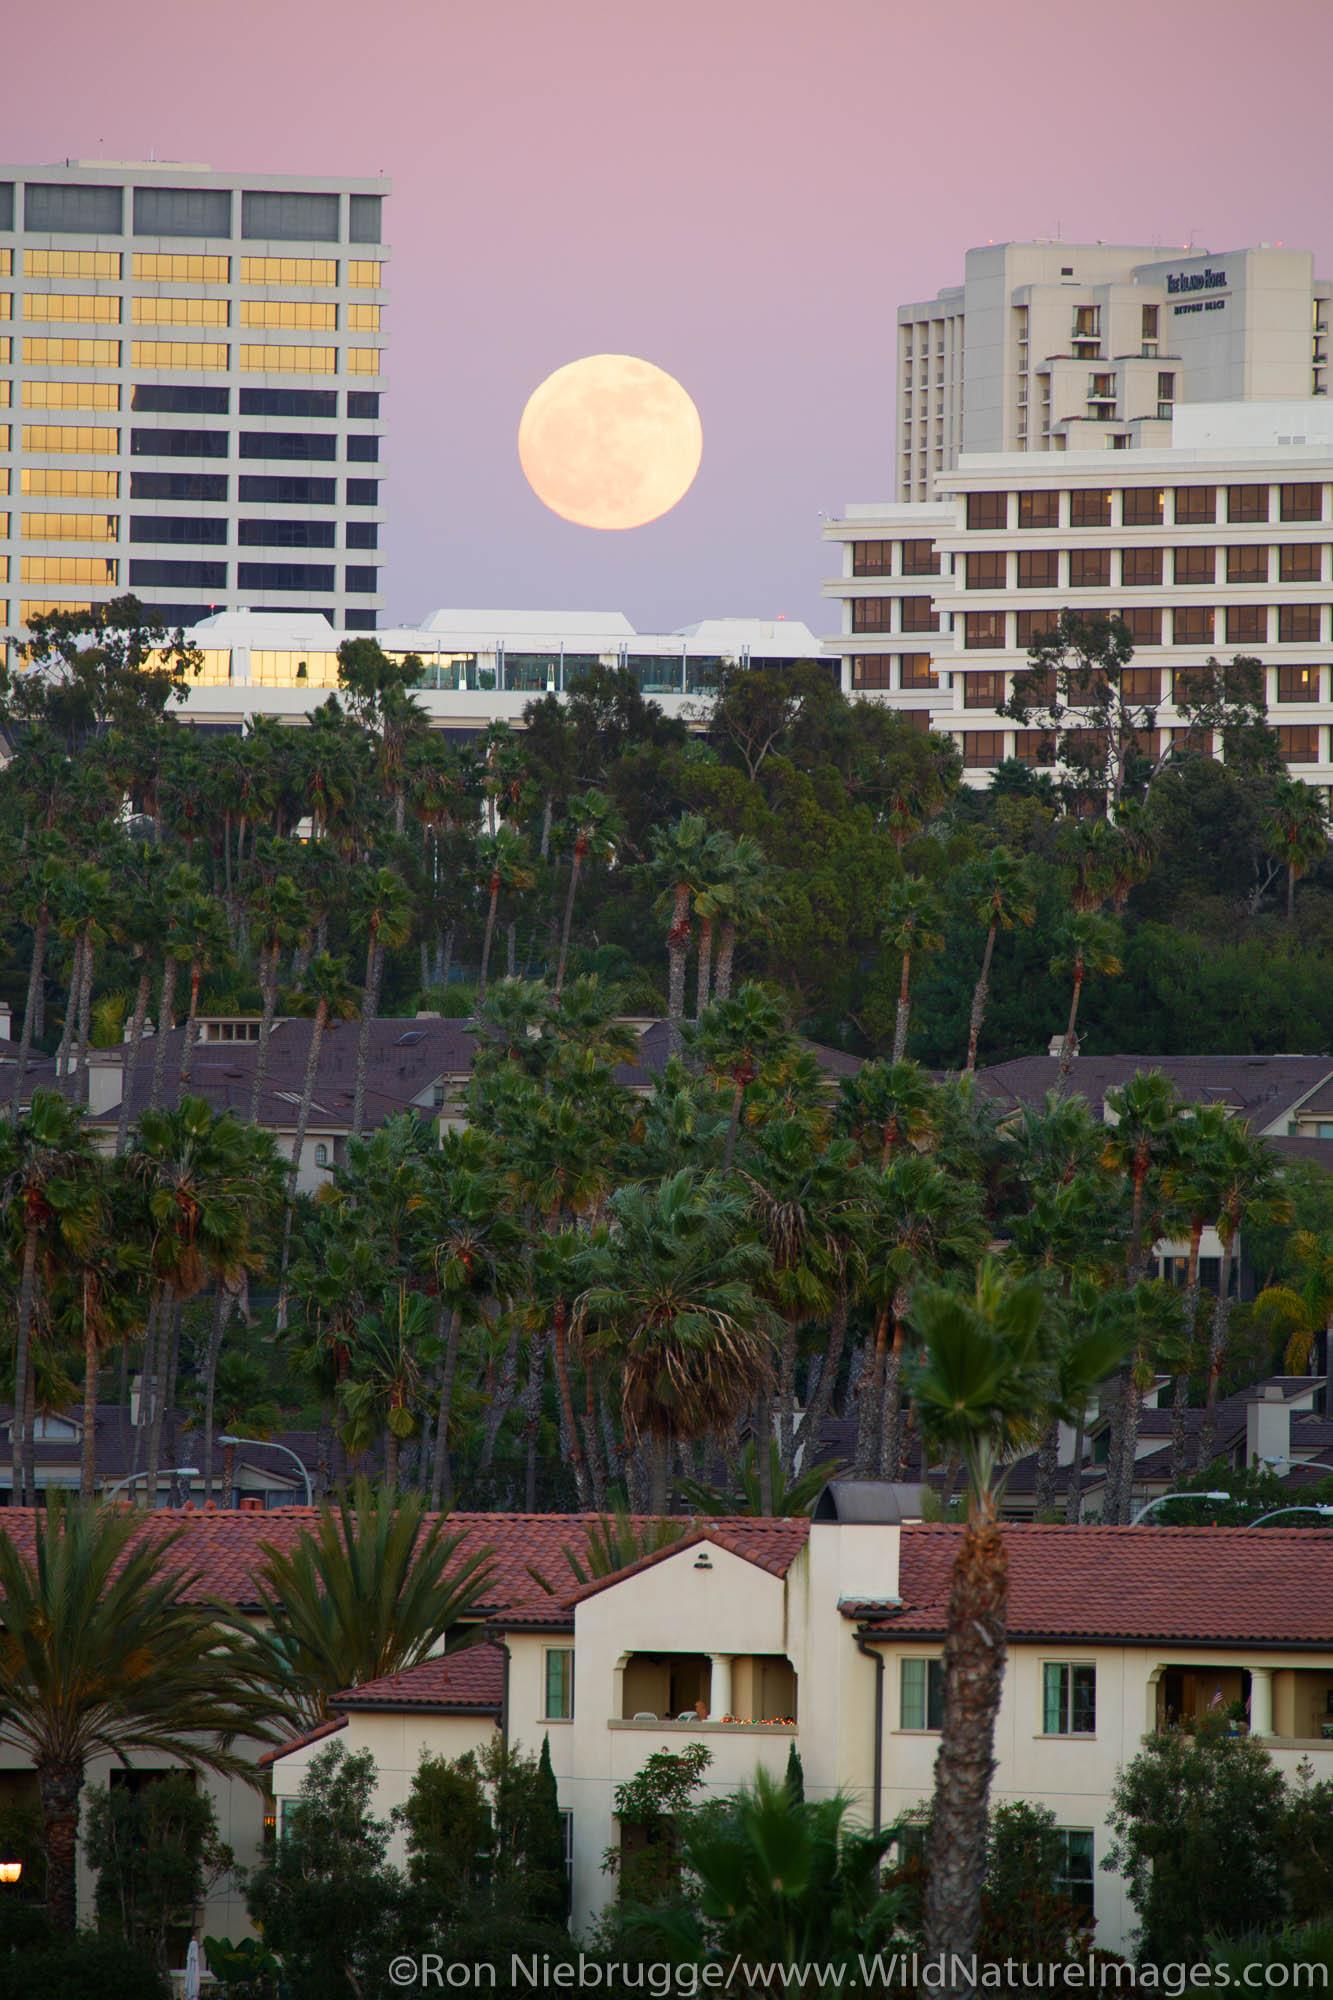 Full moon over Fashion Island, Newport Beach, Orange County, California.